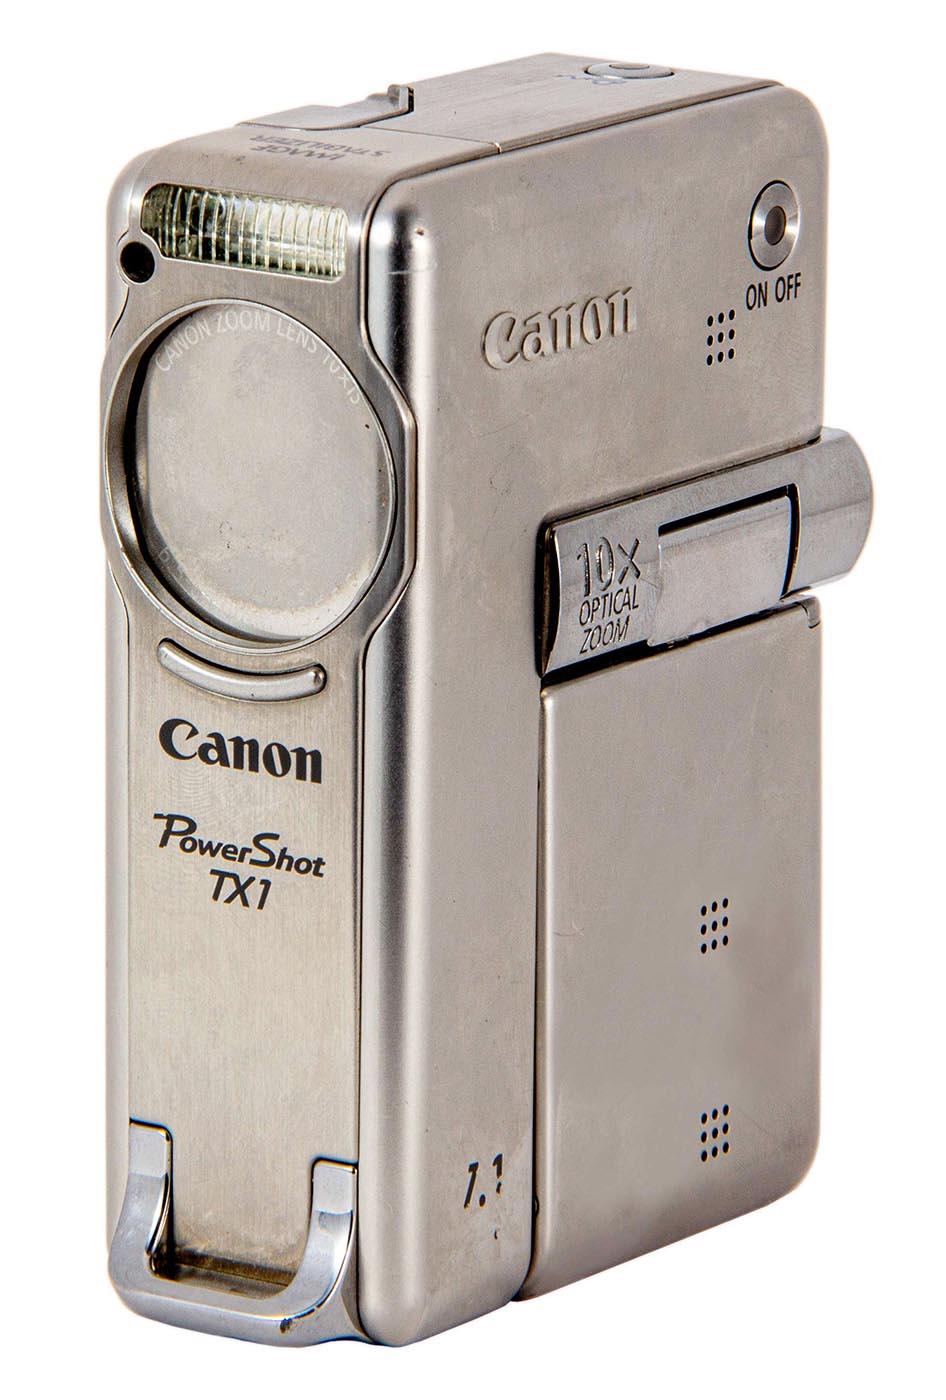 Canon PowerShot TX1 Camera